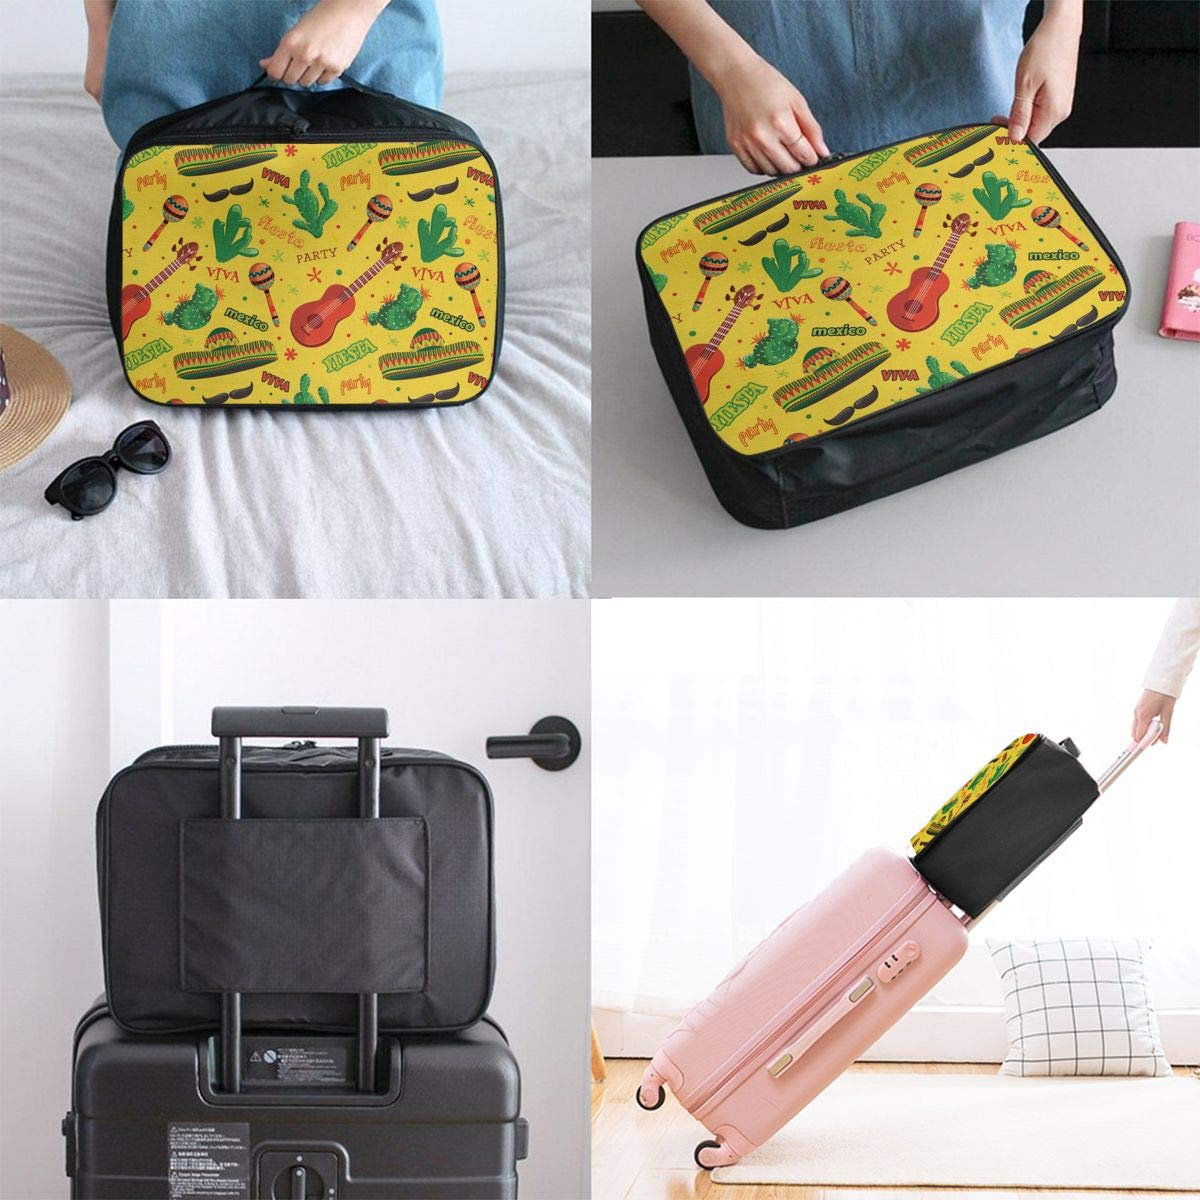 ADGAI Spanish Mexican Canvas Travel Weekender Bag,Fashion Custom Lightweight Large Capacity Portable Luggage Bag,Suitcase Trolley Bag